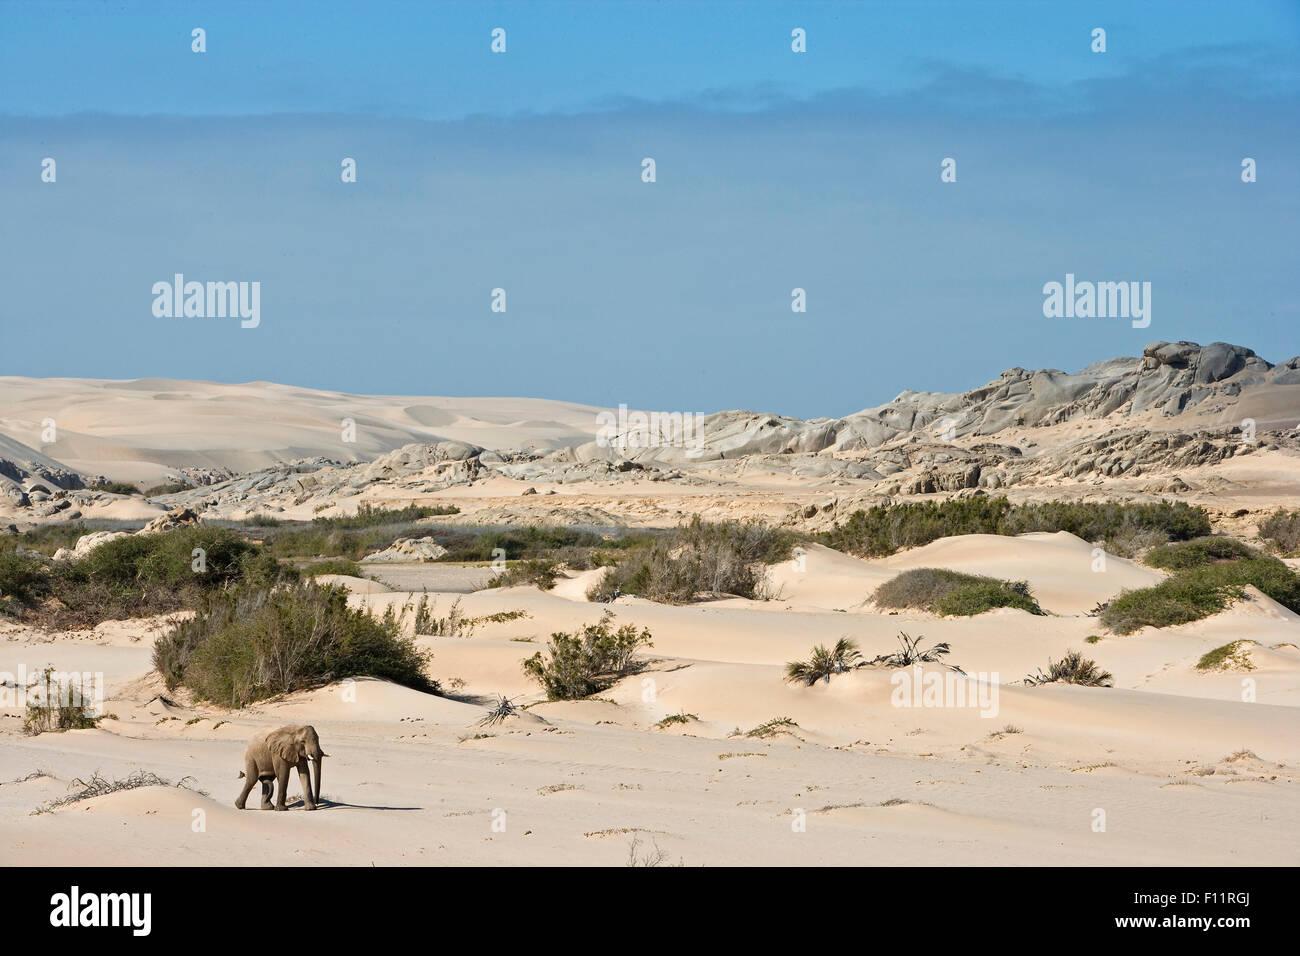 L'éléphant africain, l'éléphant du désert (Loxodonta africana africana) balades adultes le désert Namib-Skeleton Coast National Park, Namibie Banque D'Images